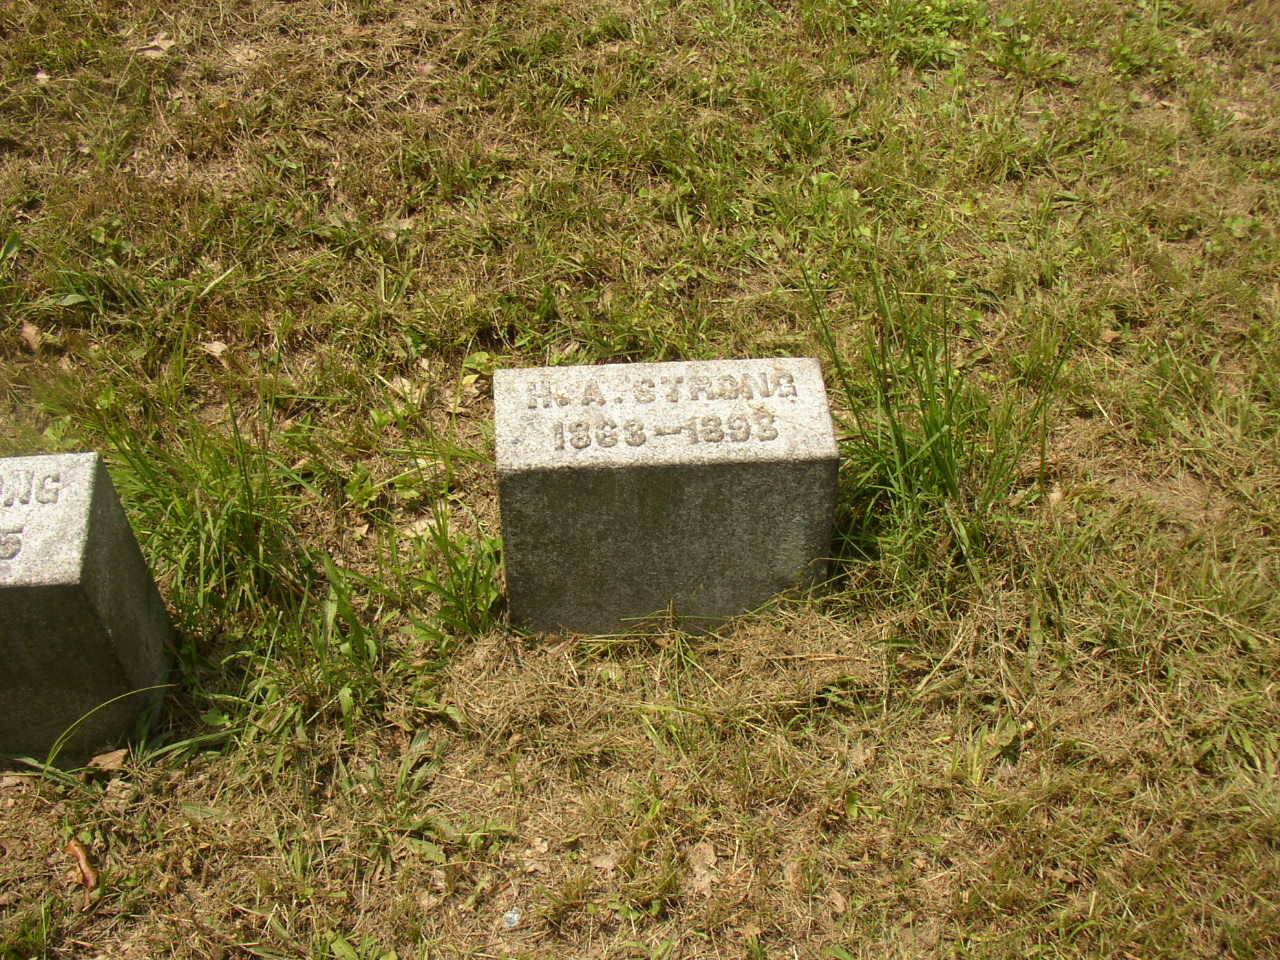 3rd Son's grave